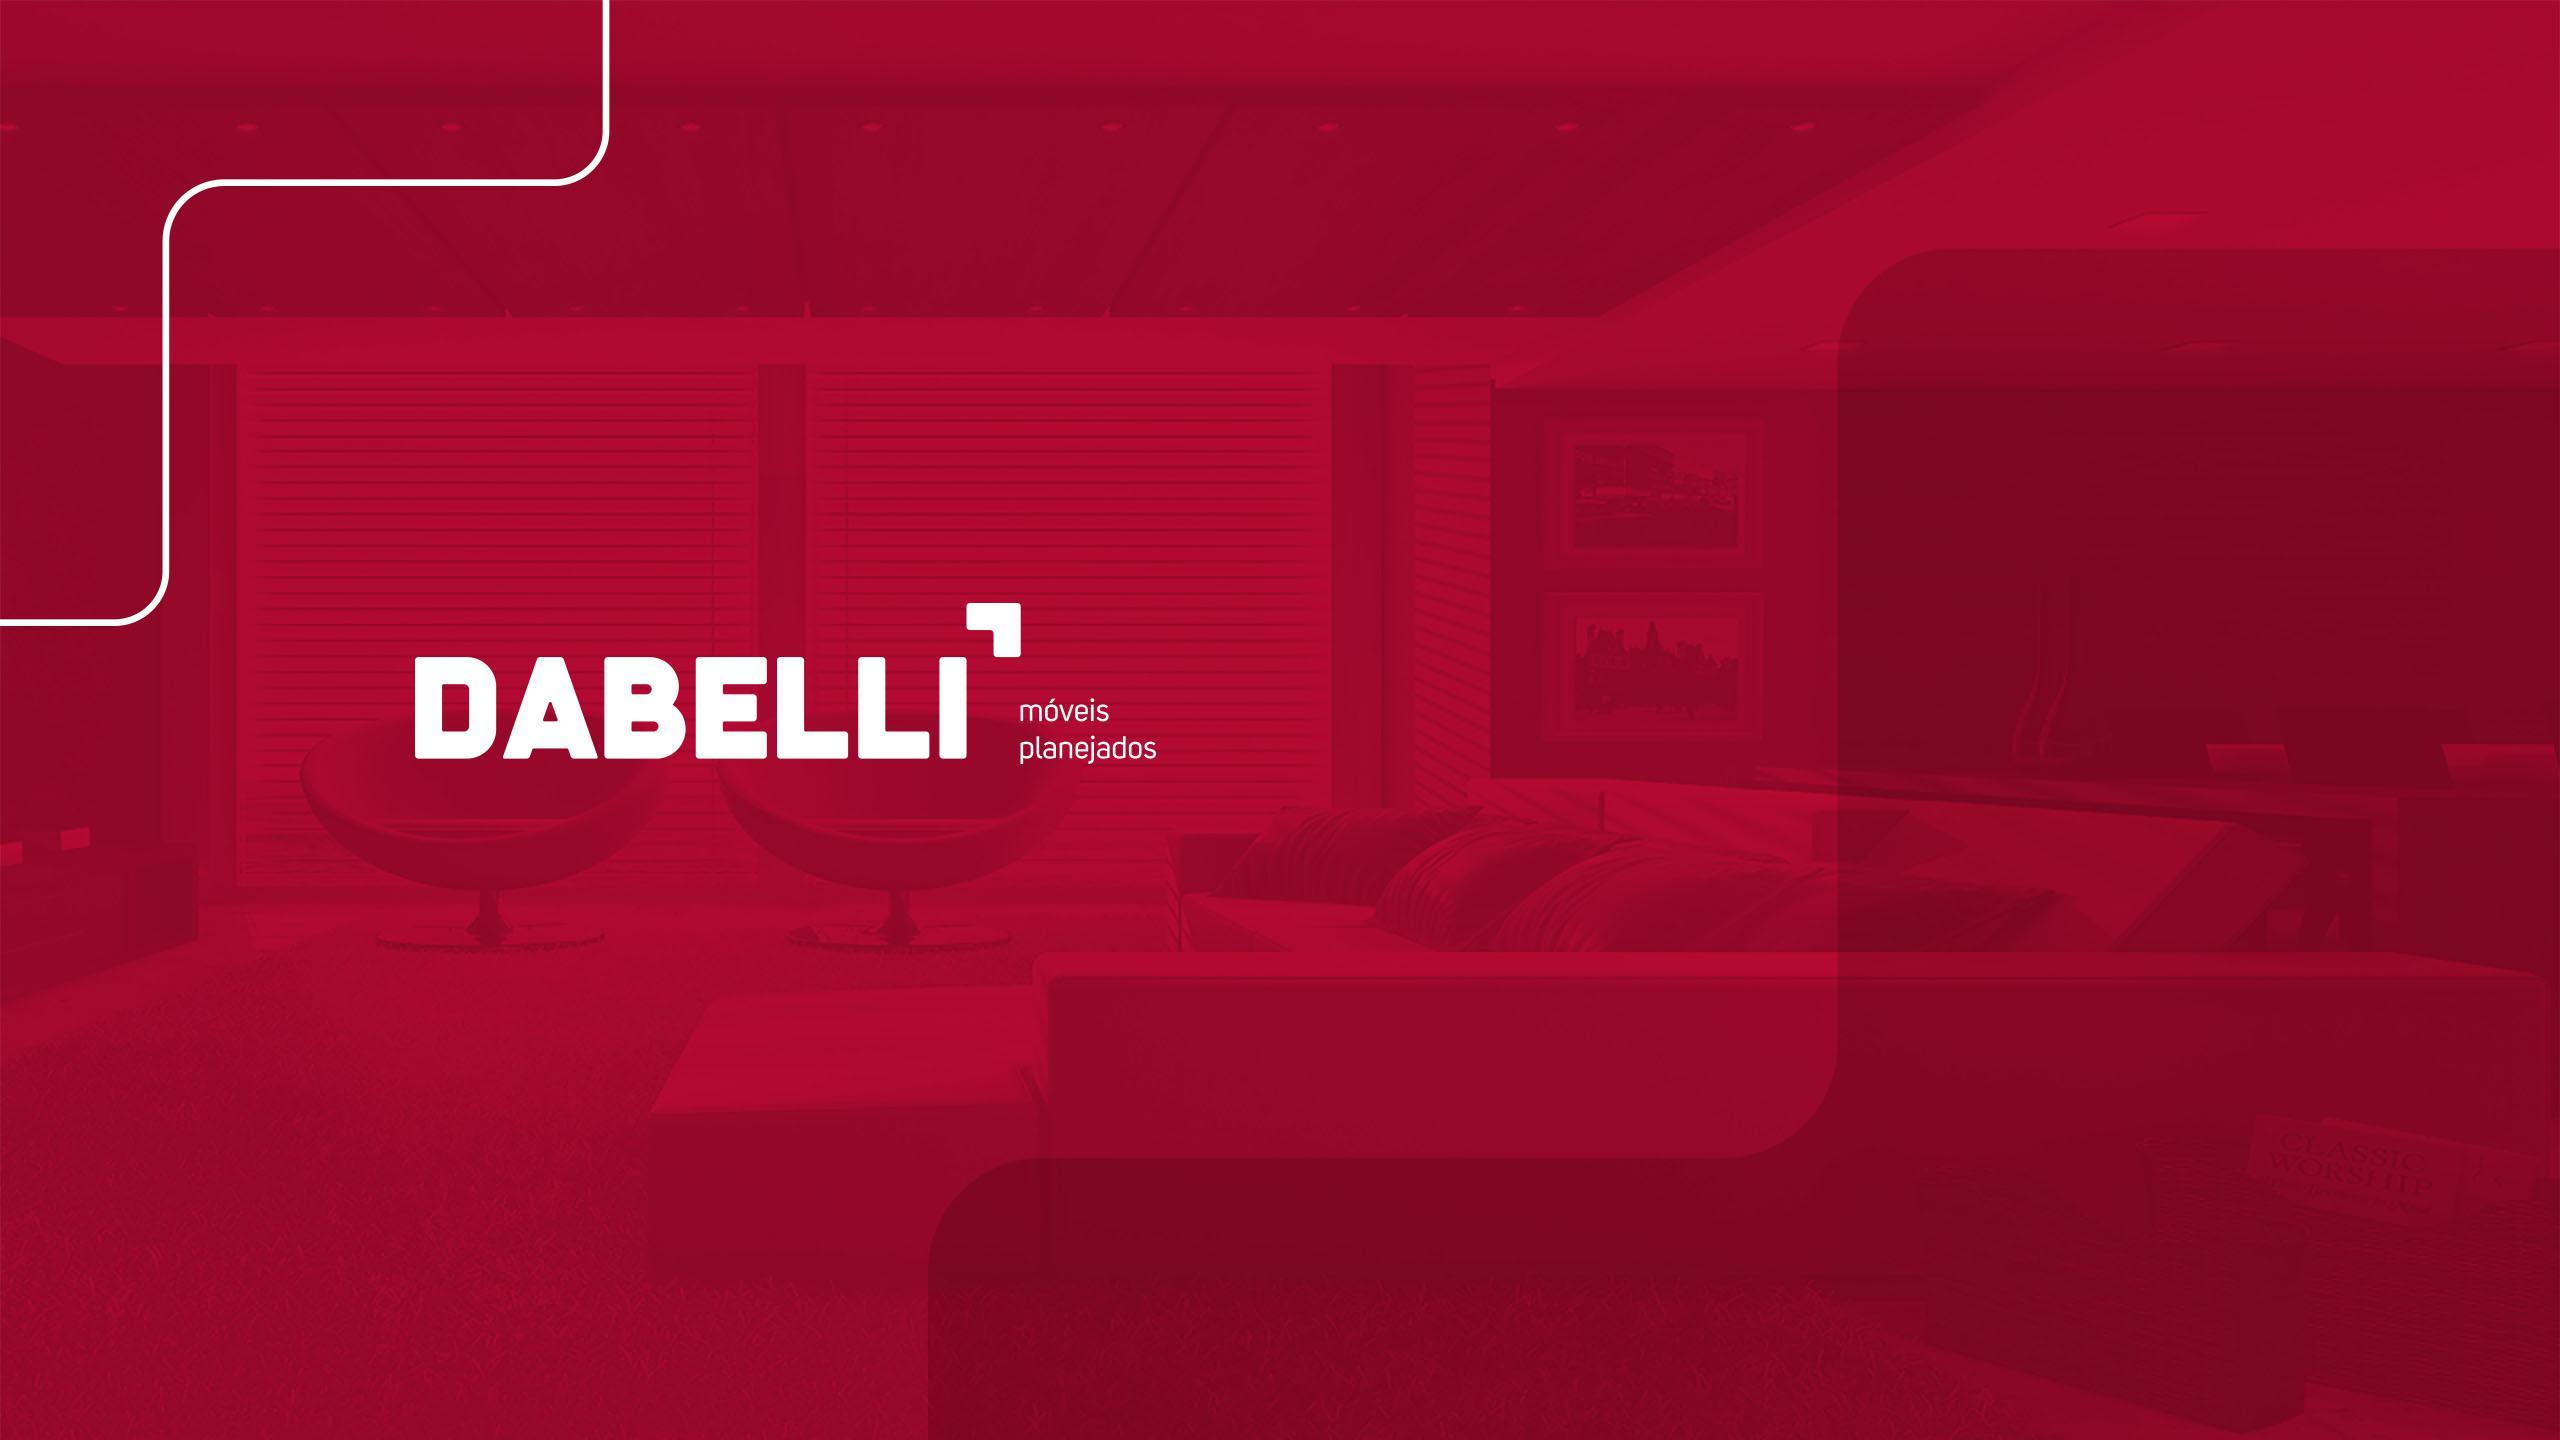 Dabelli